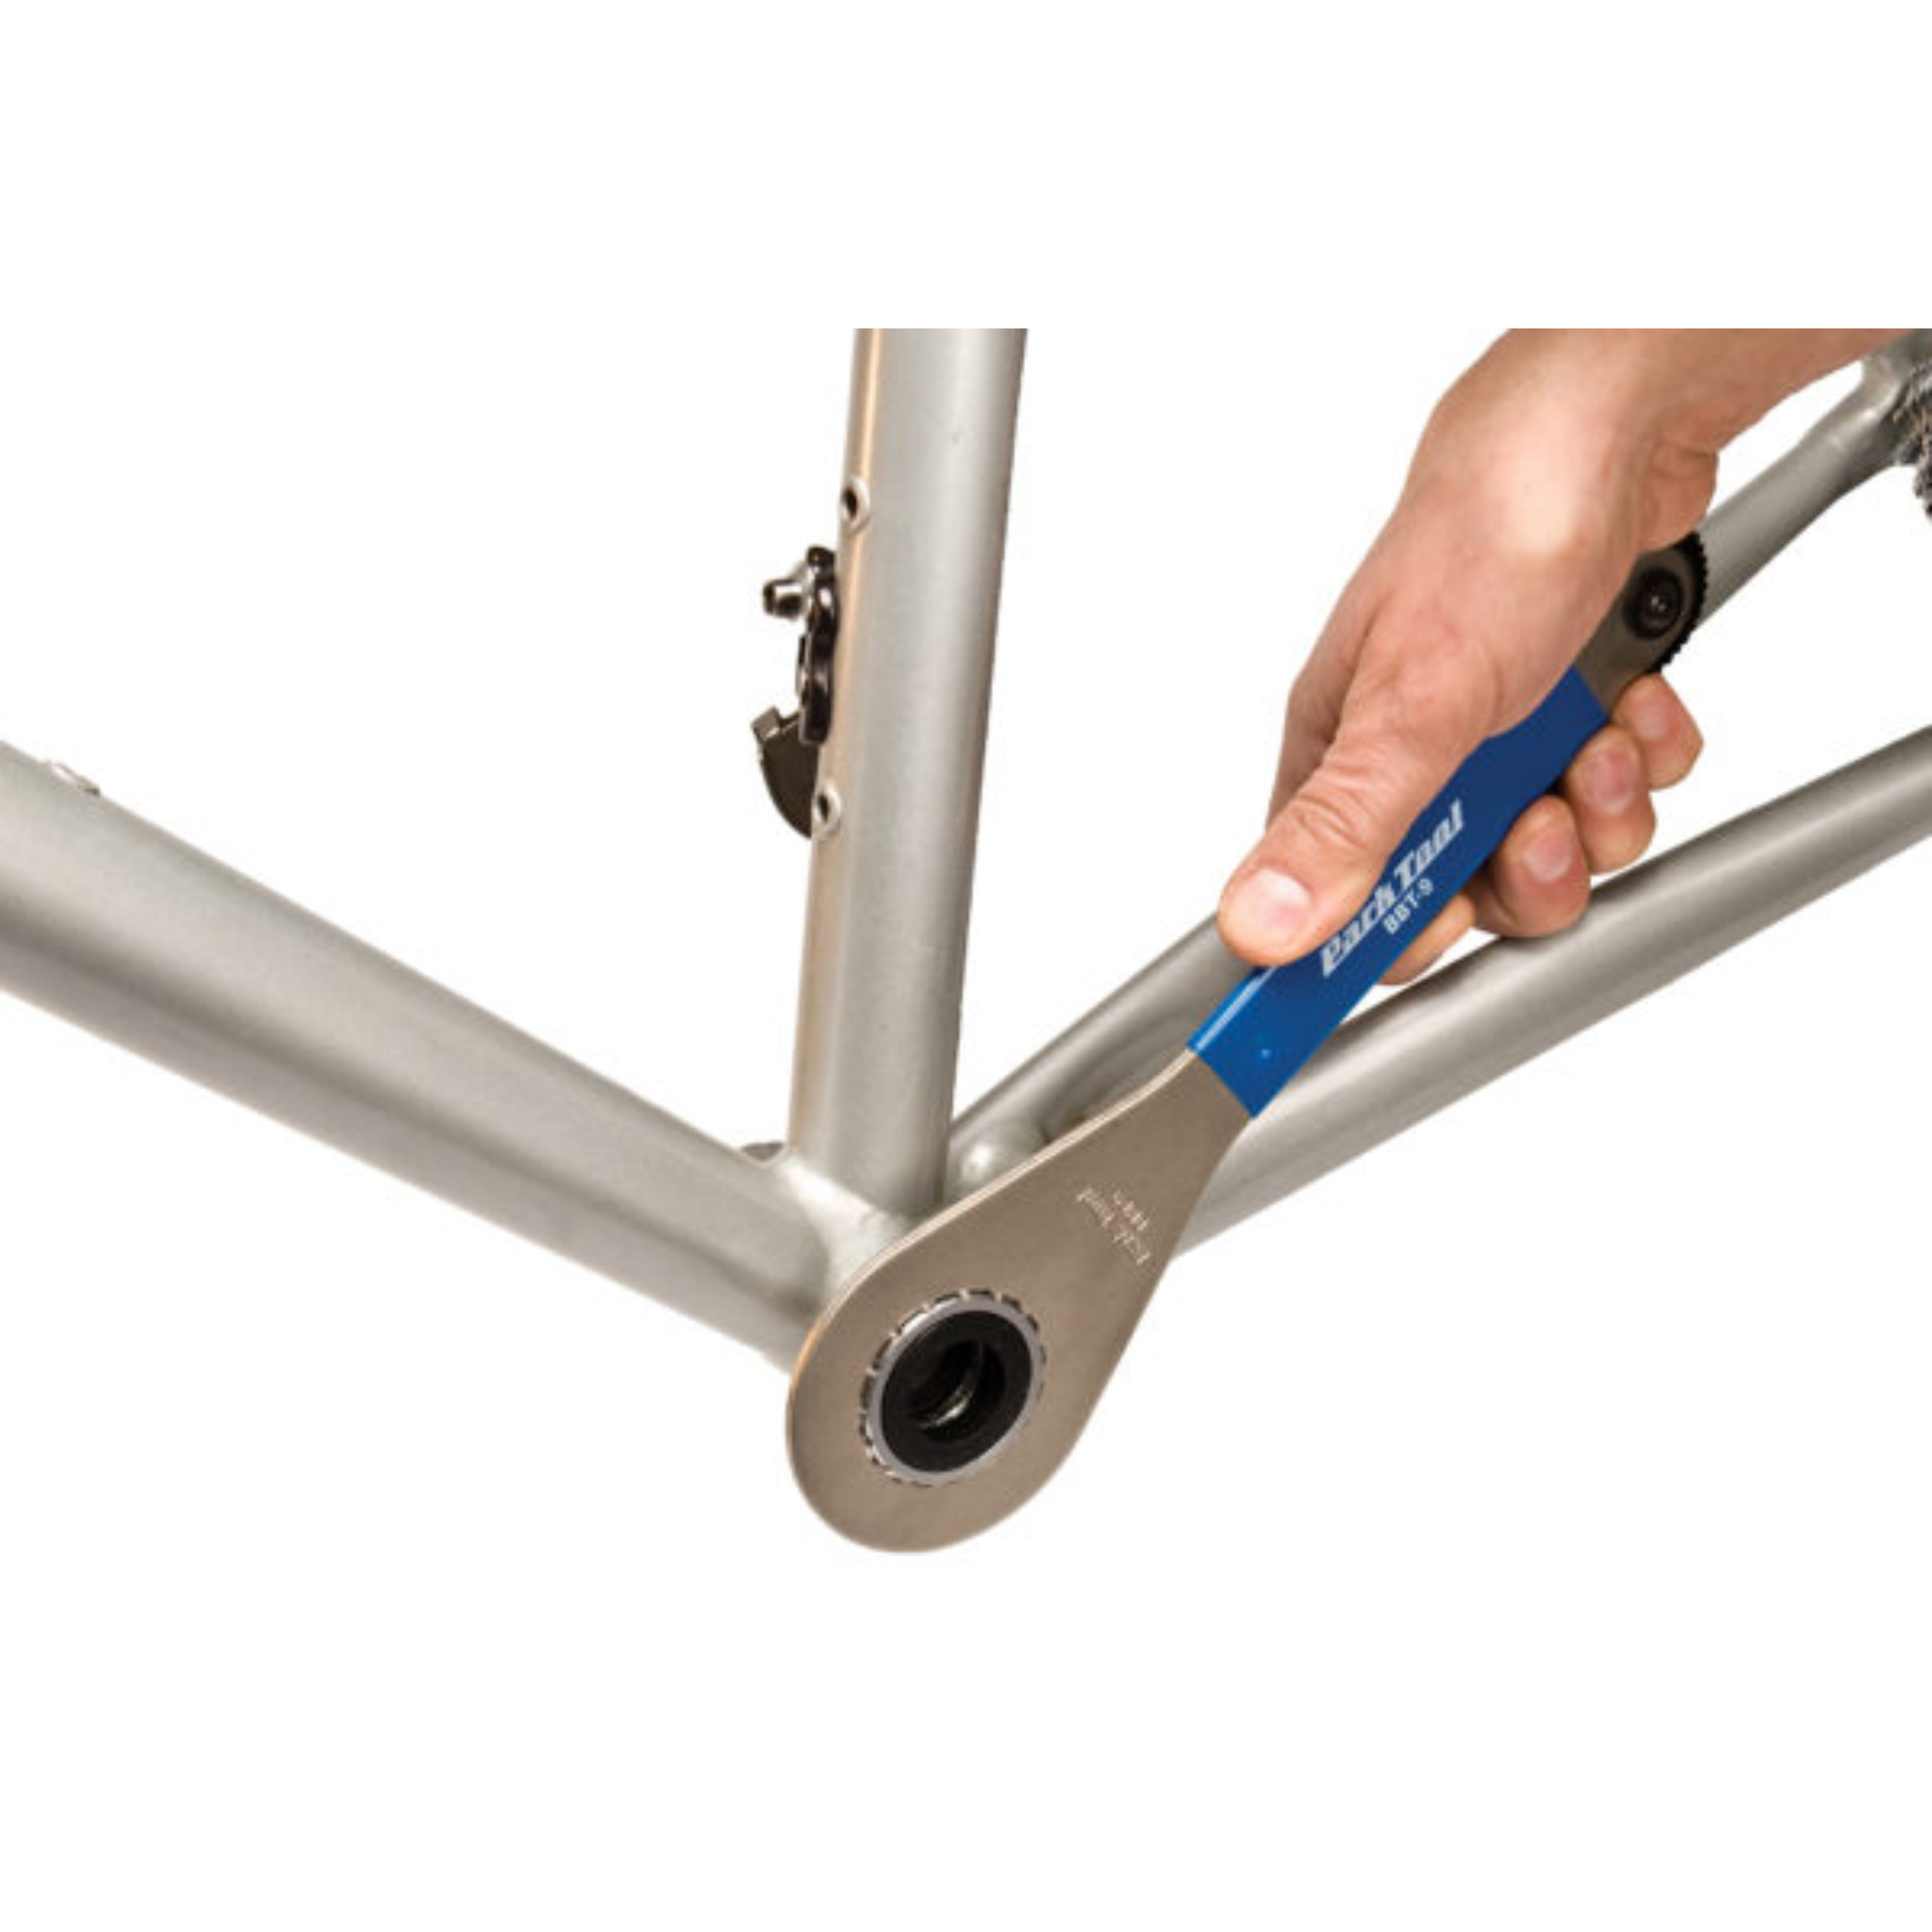 BikeHand 3 in 1 Bicycle Bottom Bracket Tool for Shimano Hollowtech II FSA Sram